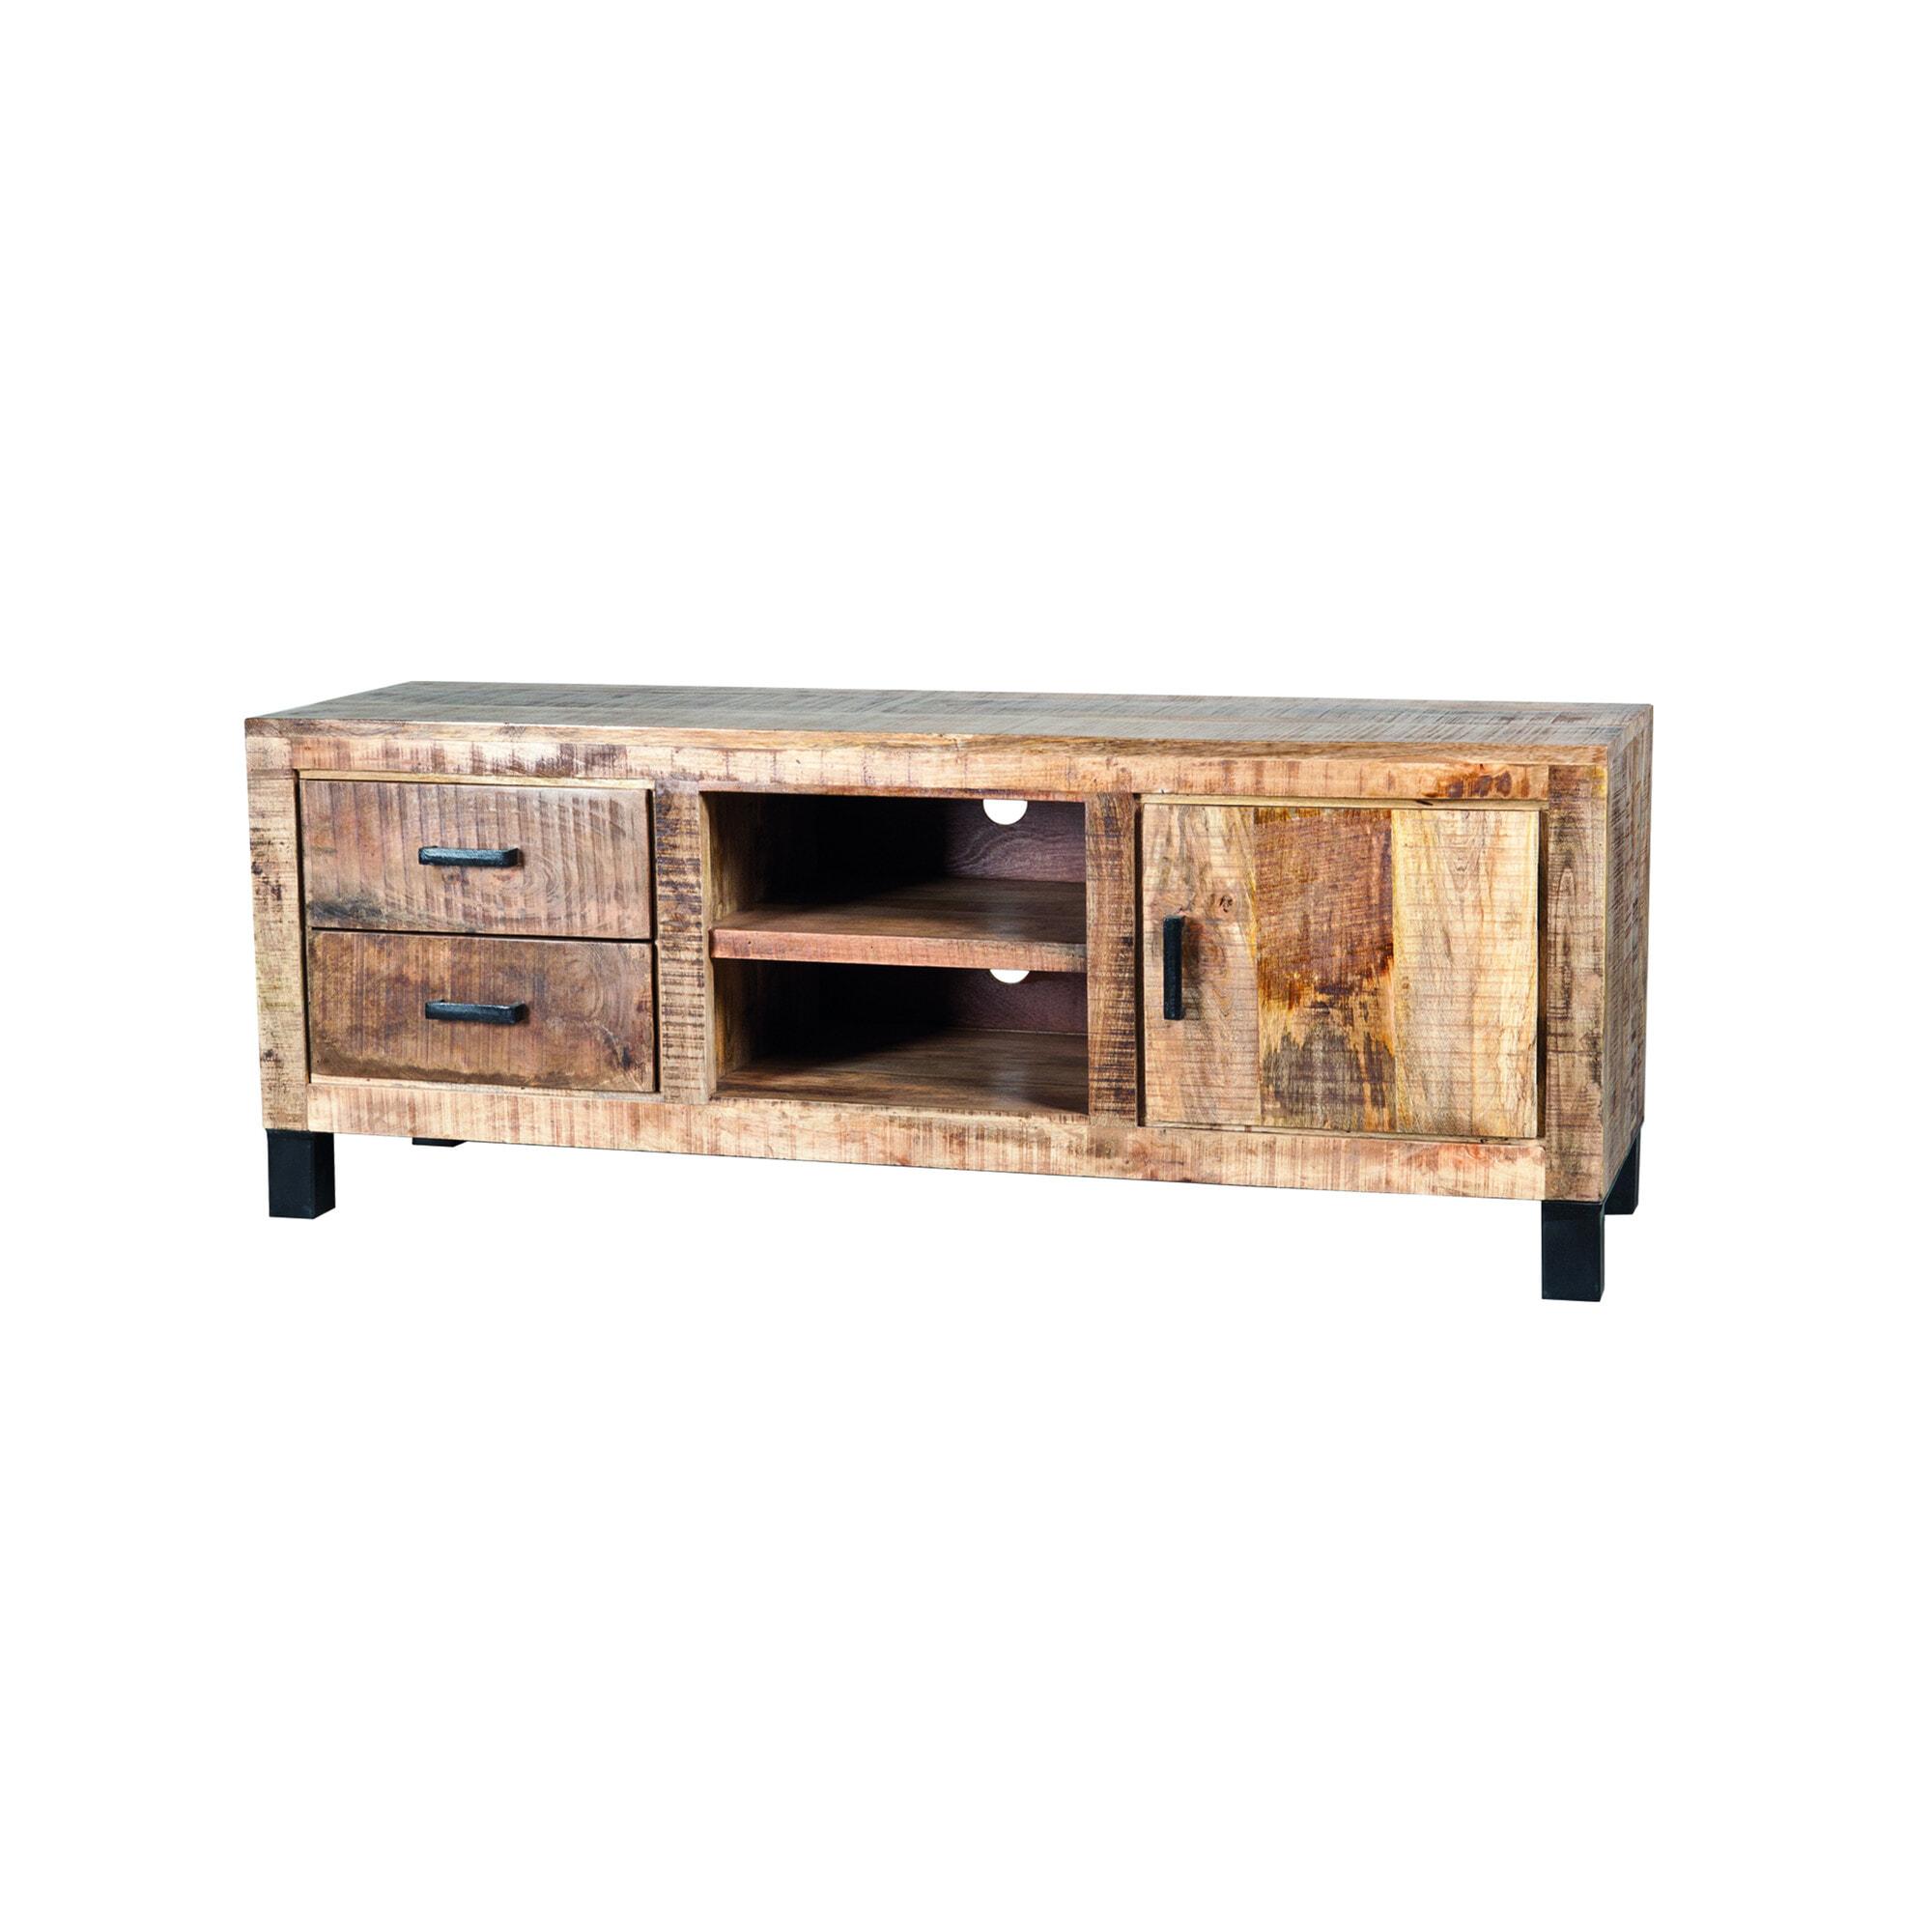 Eleonora Tv-meubel 'Iron XL Industrieel' 150 cm   Eleonora